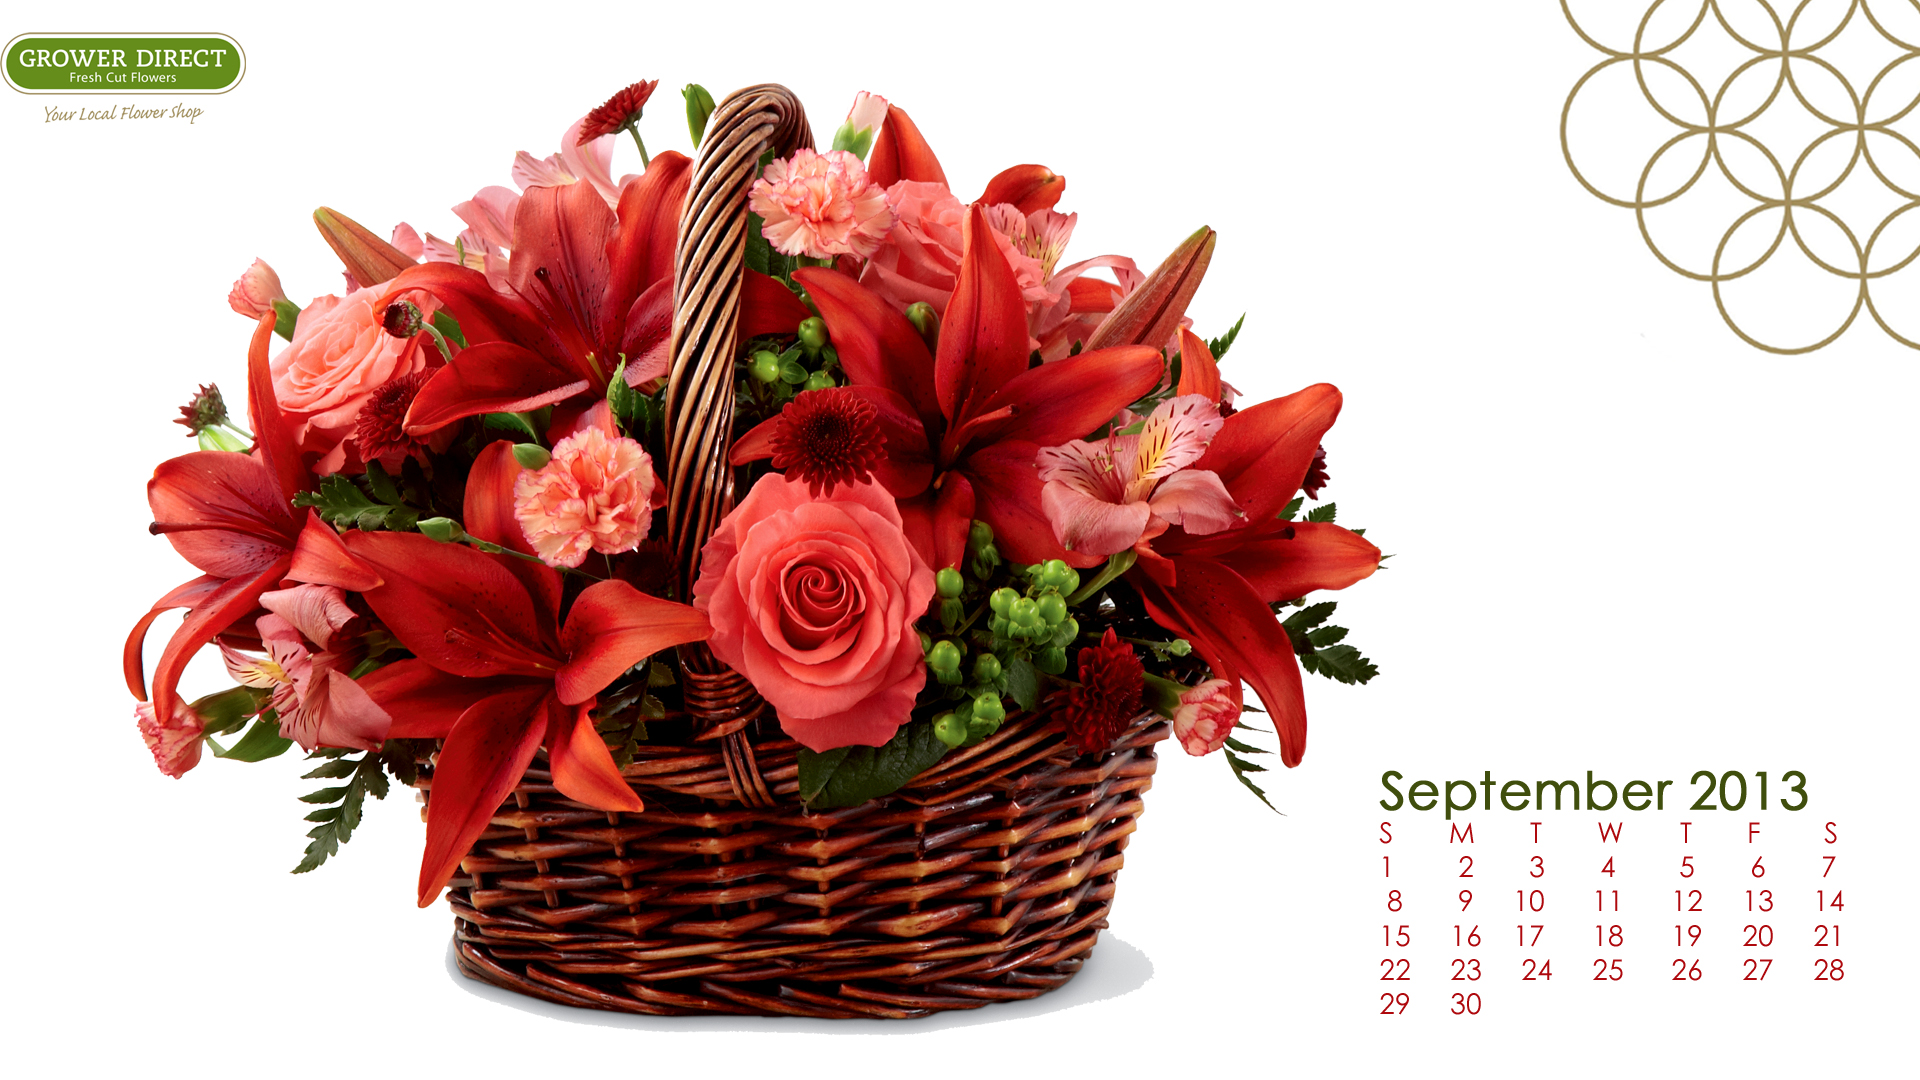 Freebie Friday: Free September 2013 Desktop Calendar Wallpaper